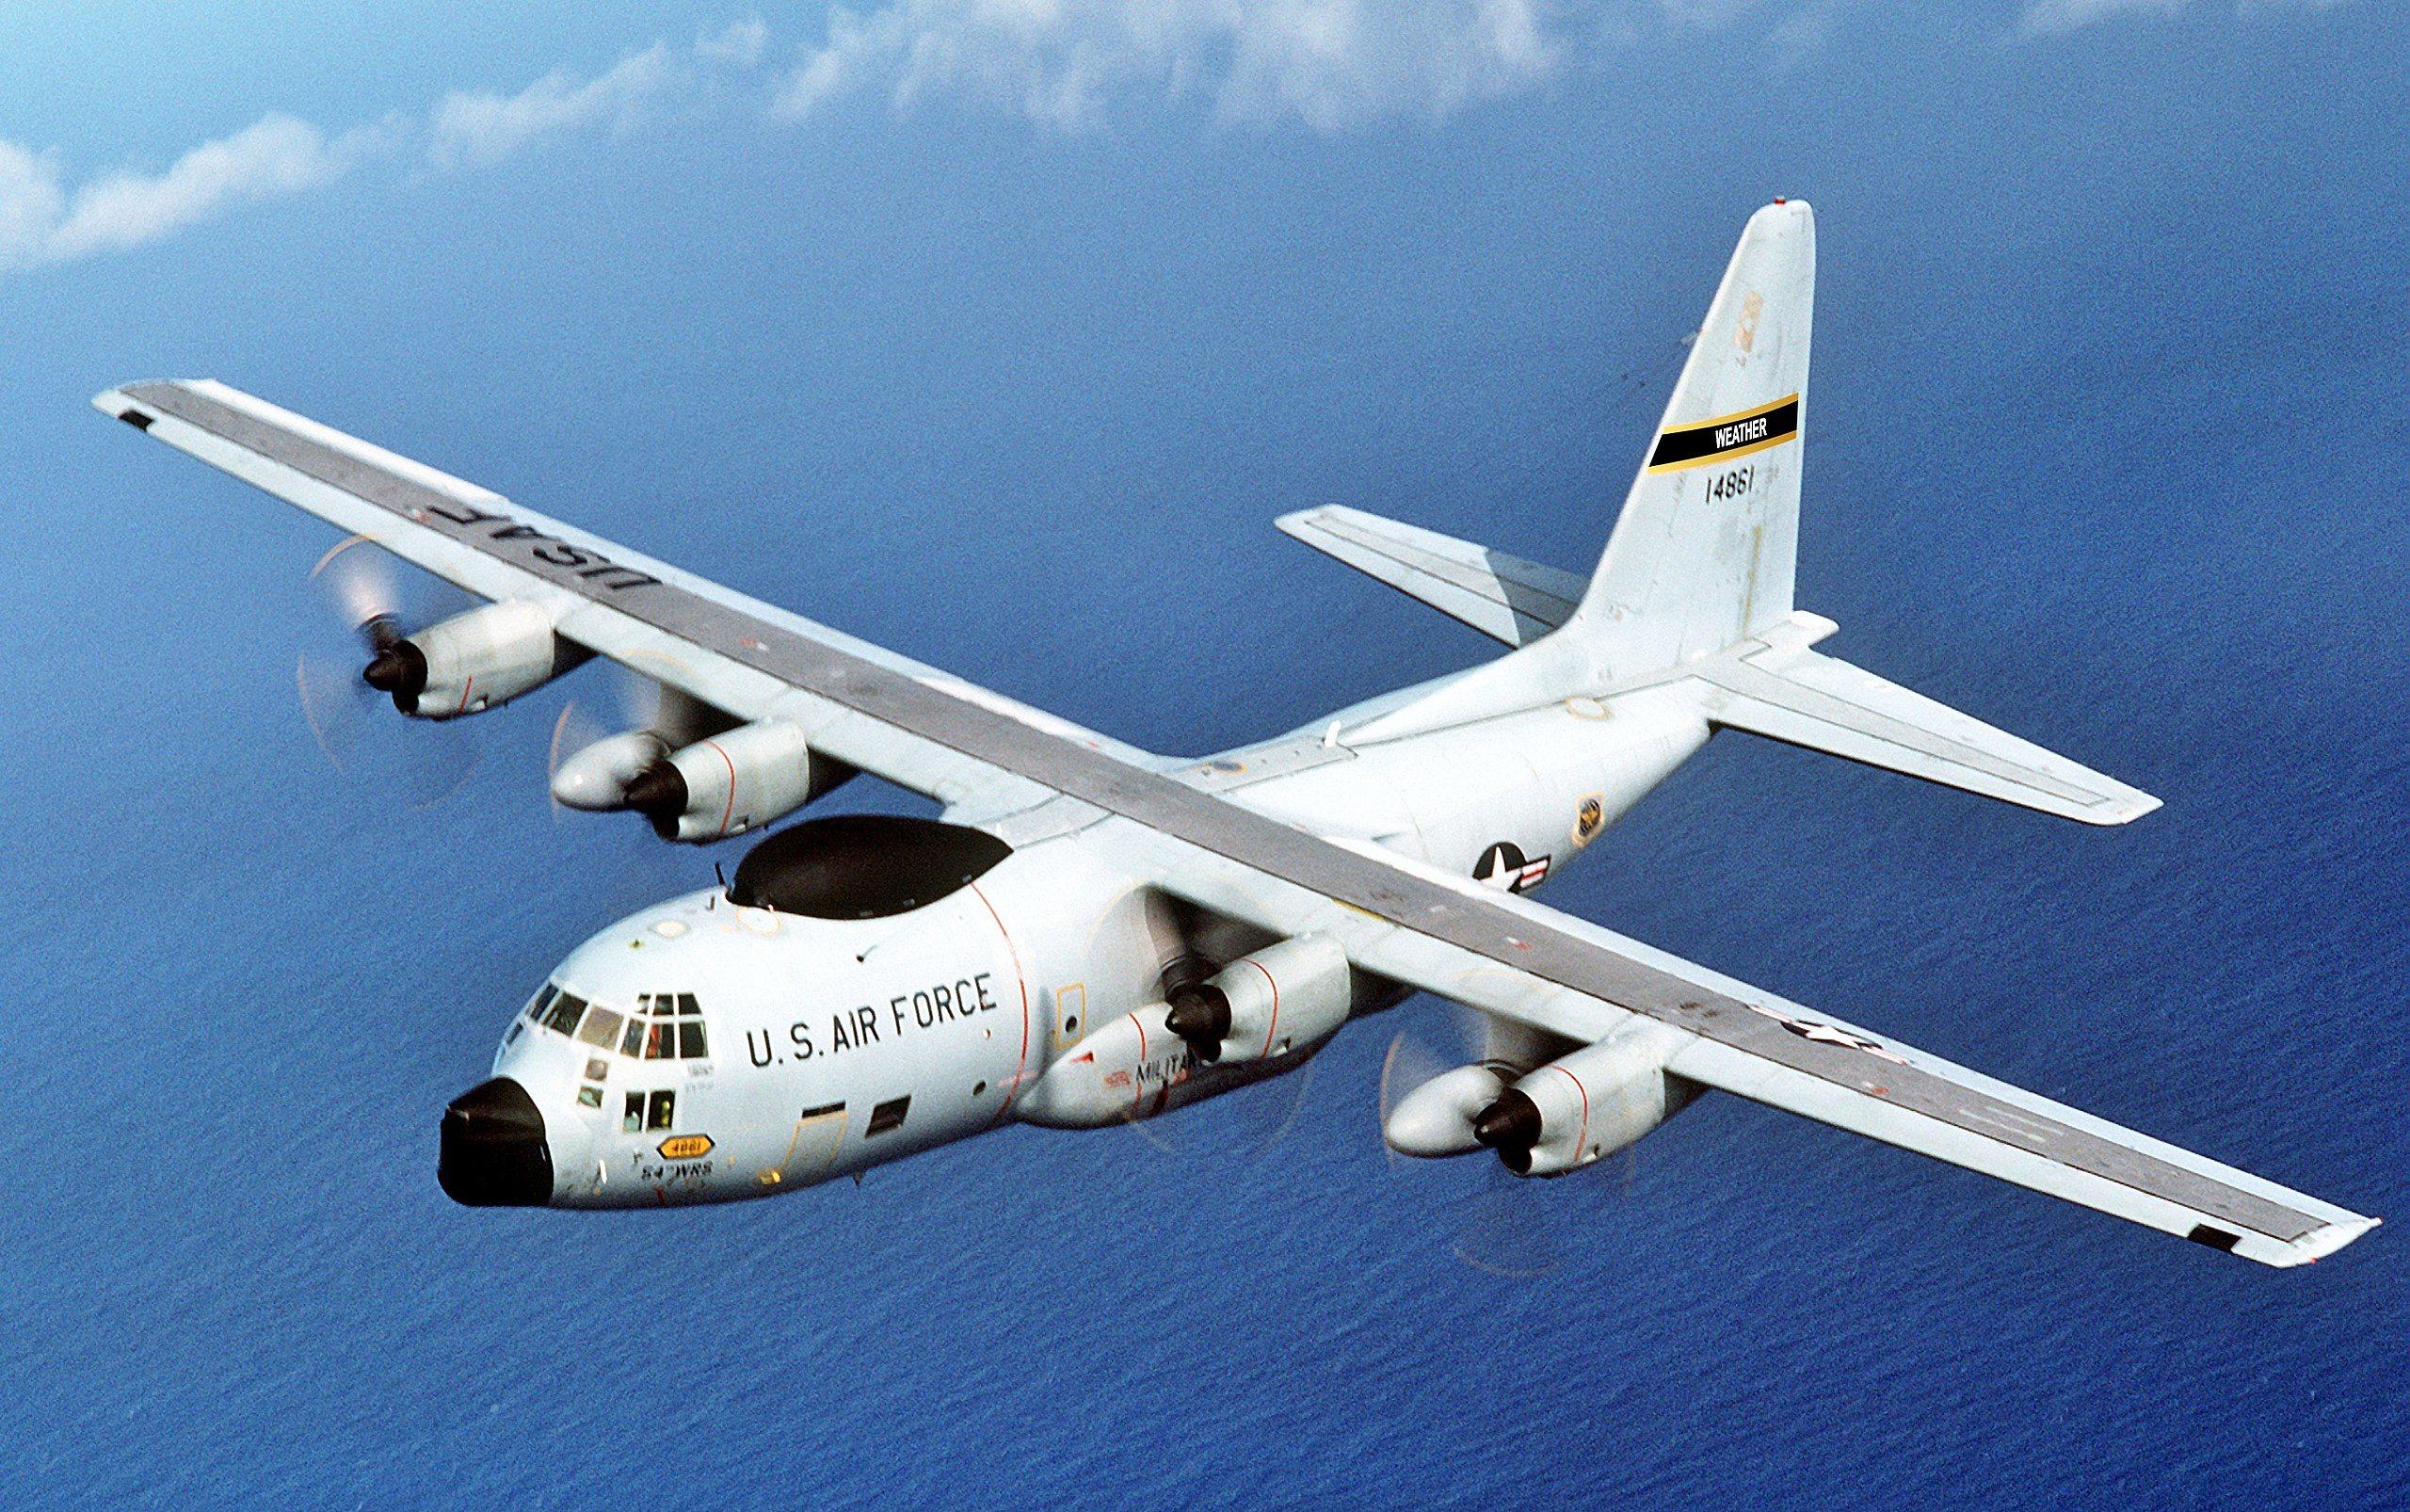 WC-130 cargo plane